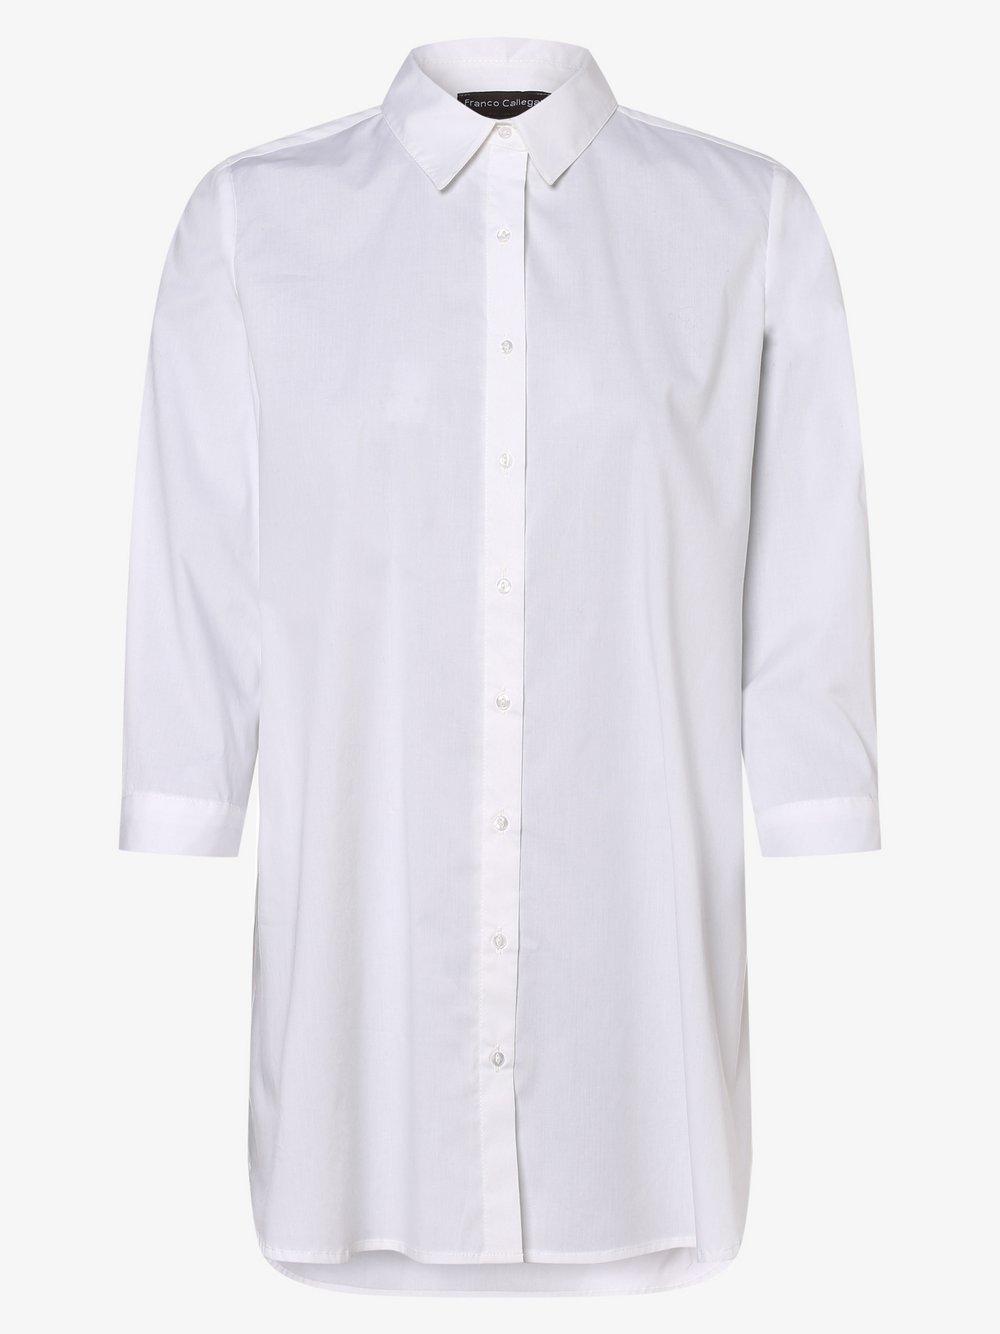 Franco Callegari – Bluzka damska, biały Van Graaf 466843-0001-00360